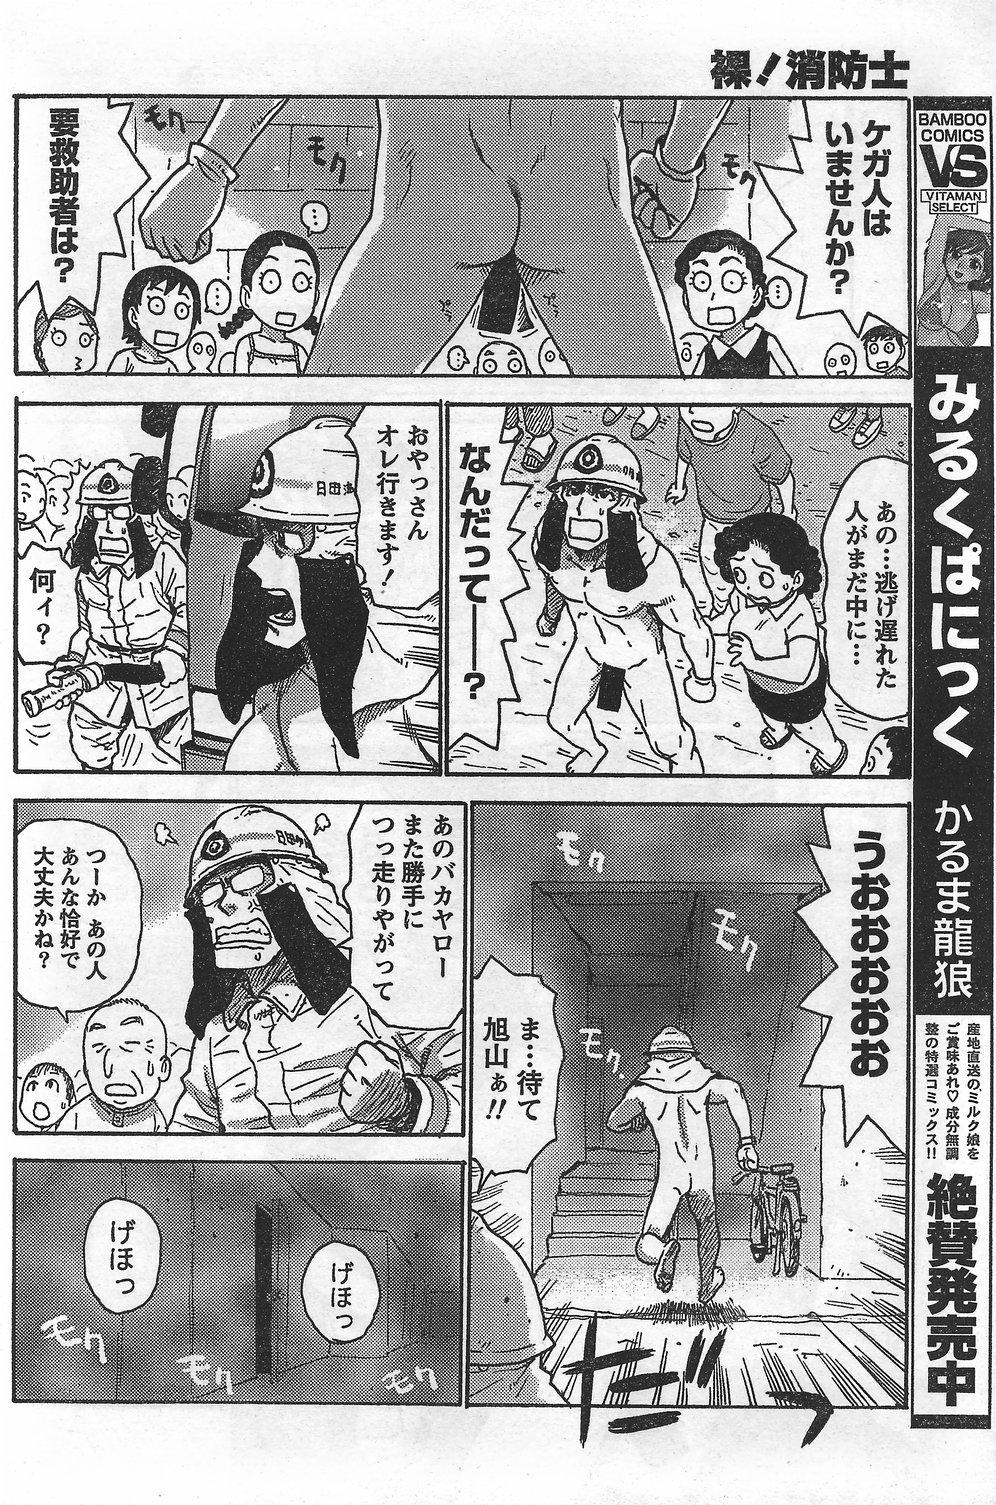 Monthly Vitaman 2007-10 103